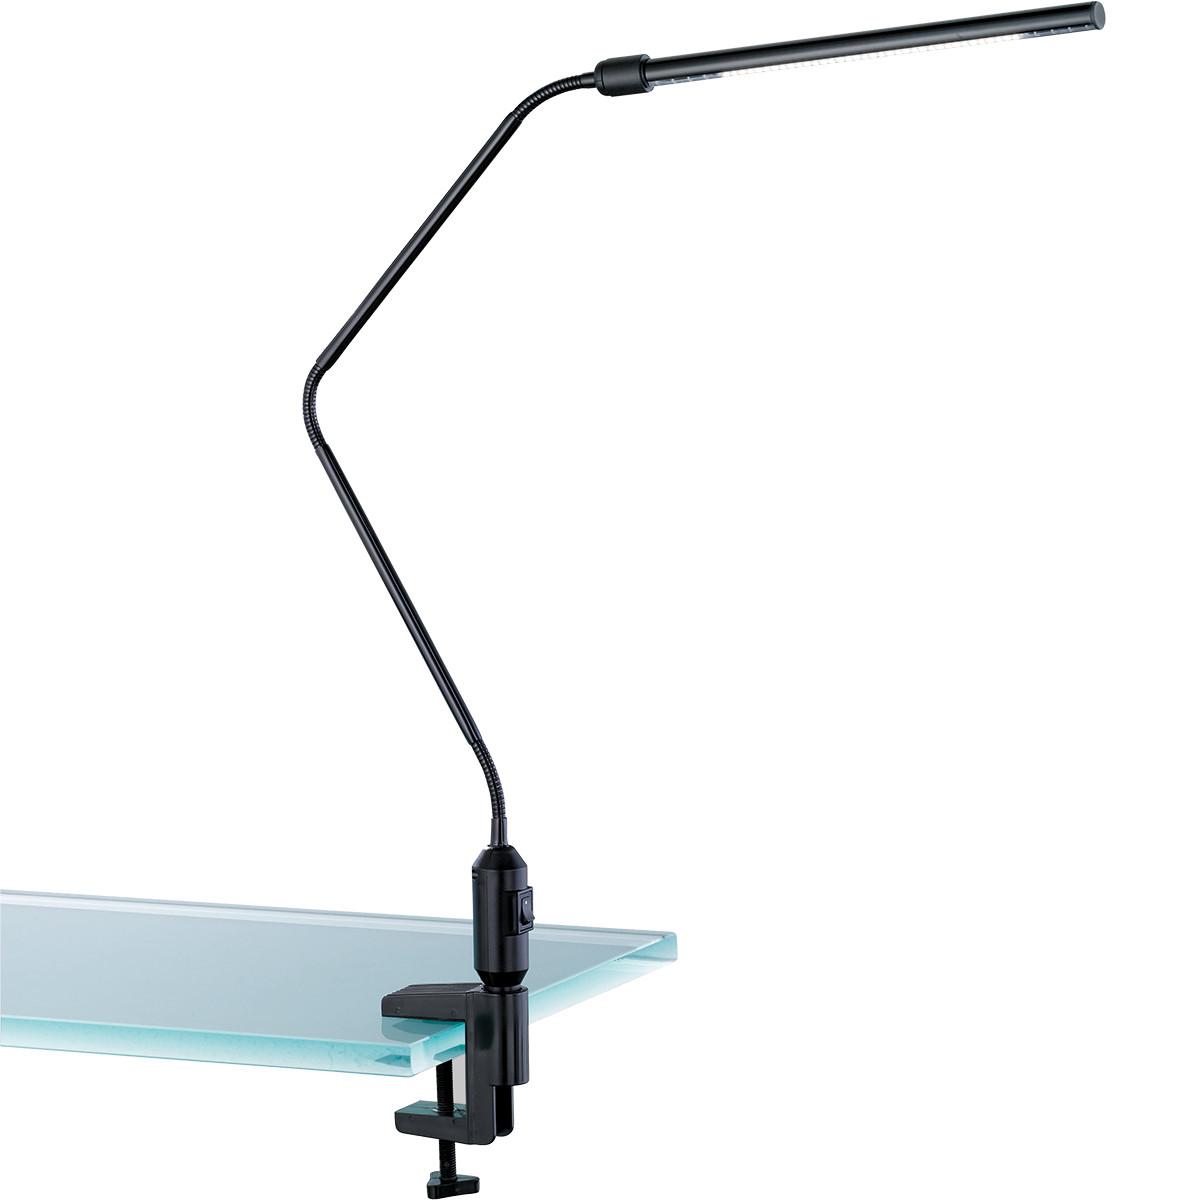 LED Klemlamp - Trion Vary - 3W - Warm Wit 3000K - Glans Zwart - Aluminium